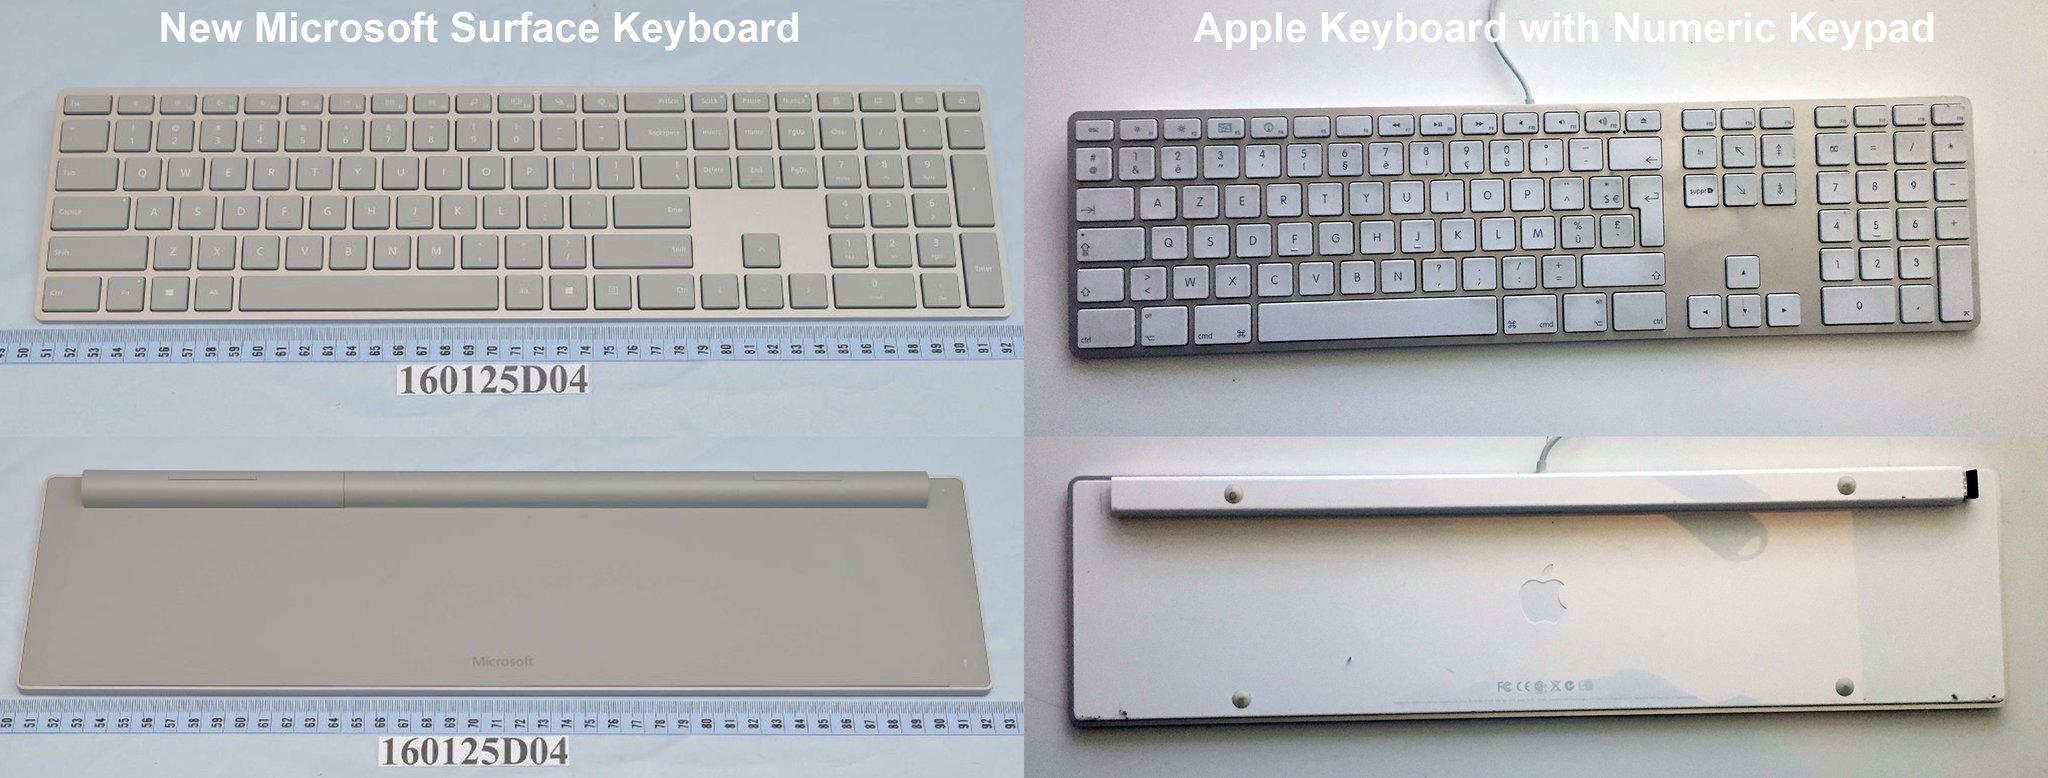 microsoft surface comparison